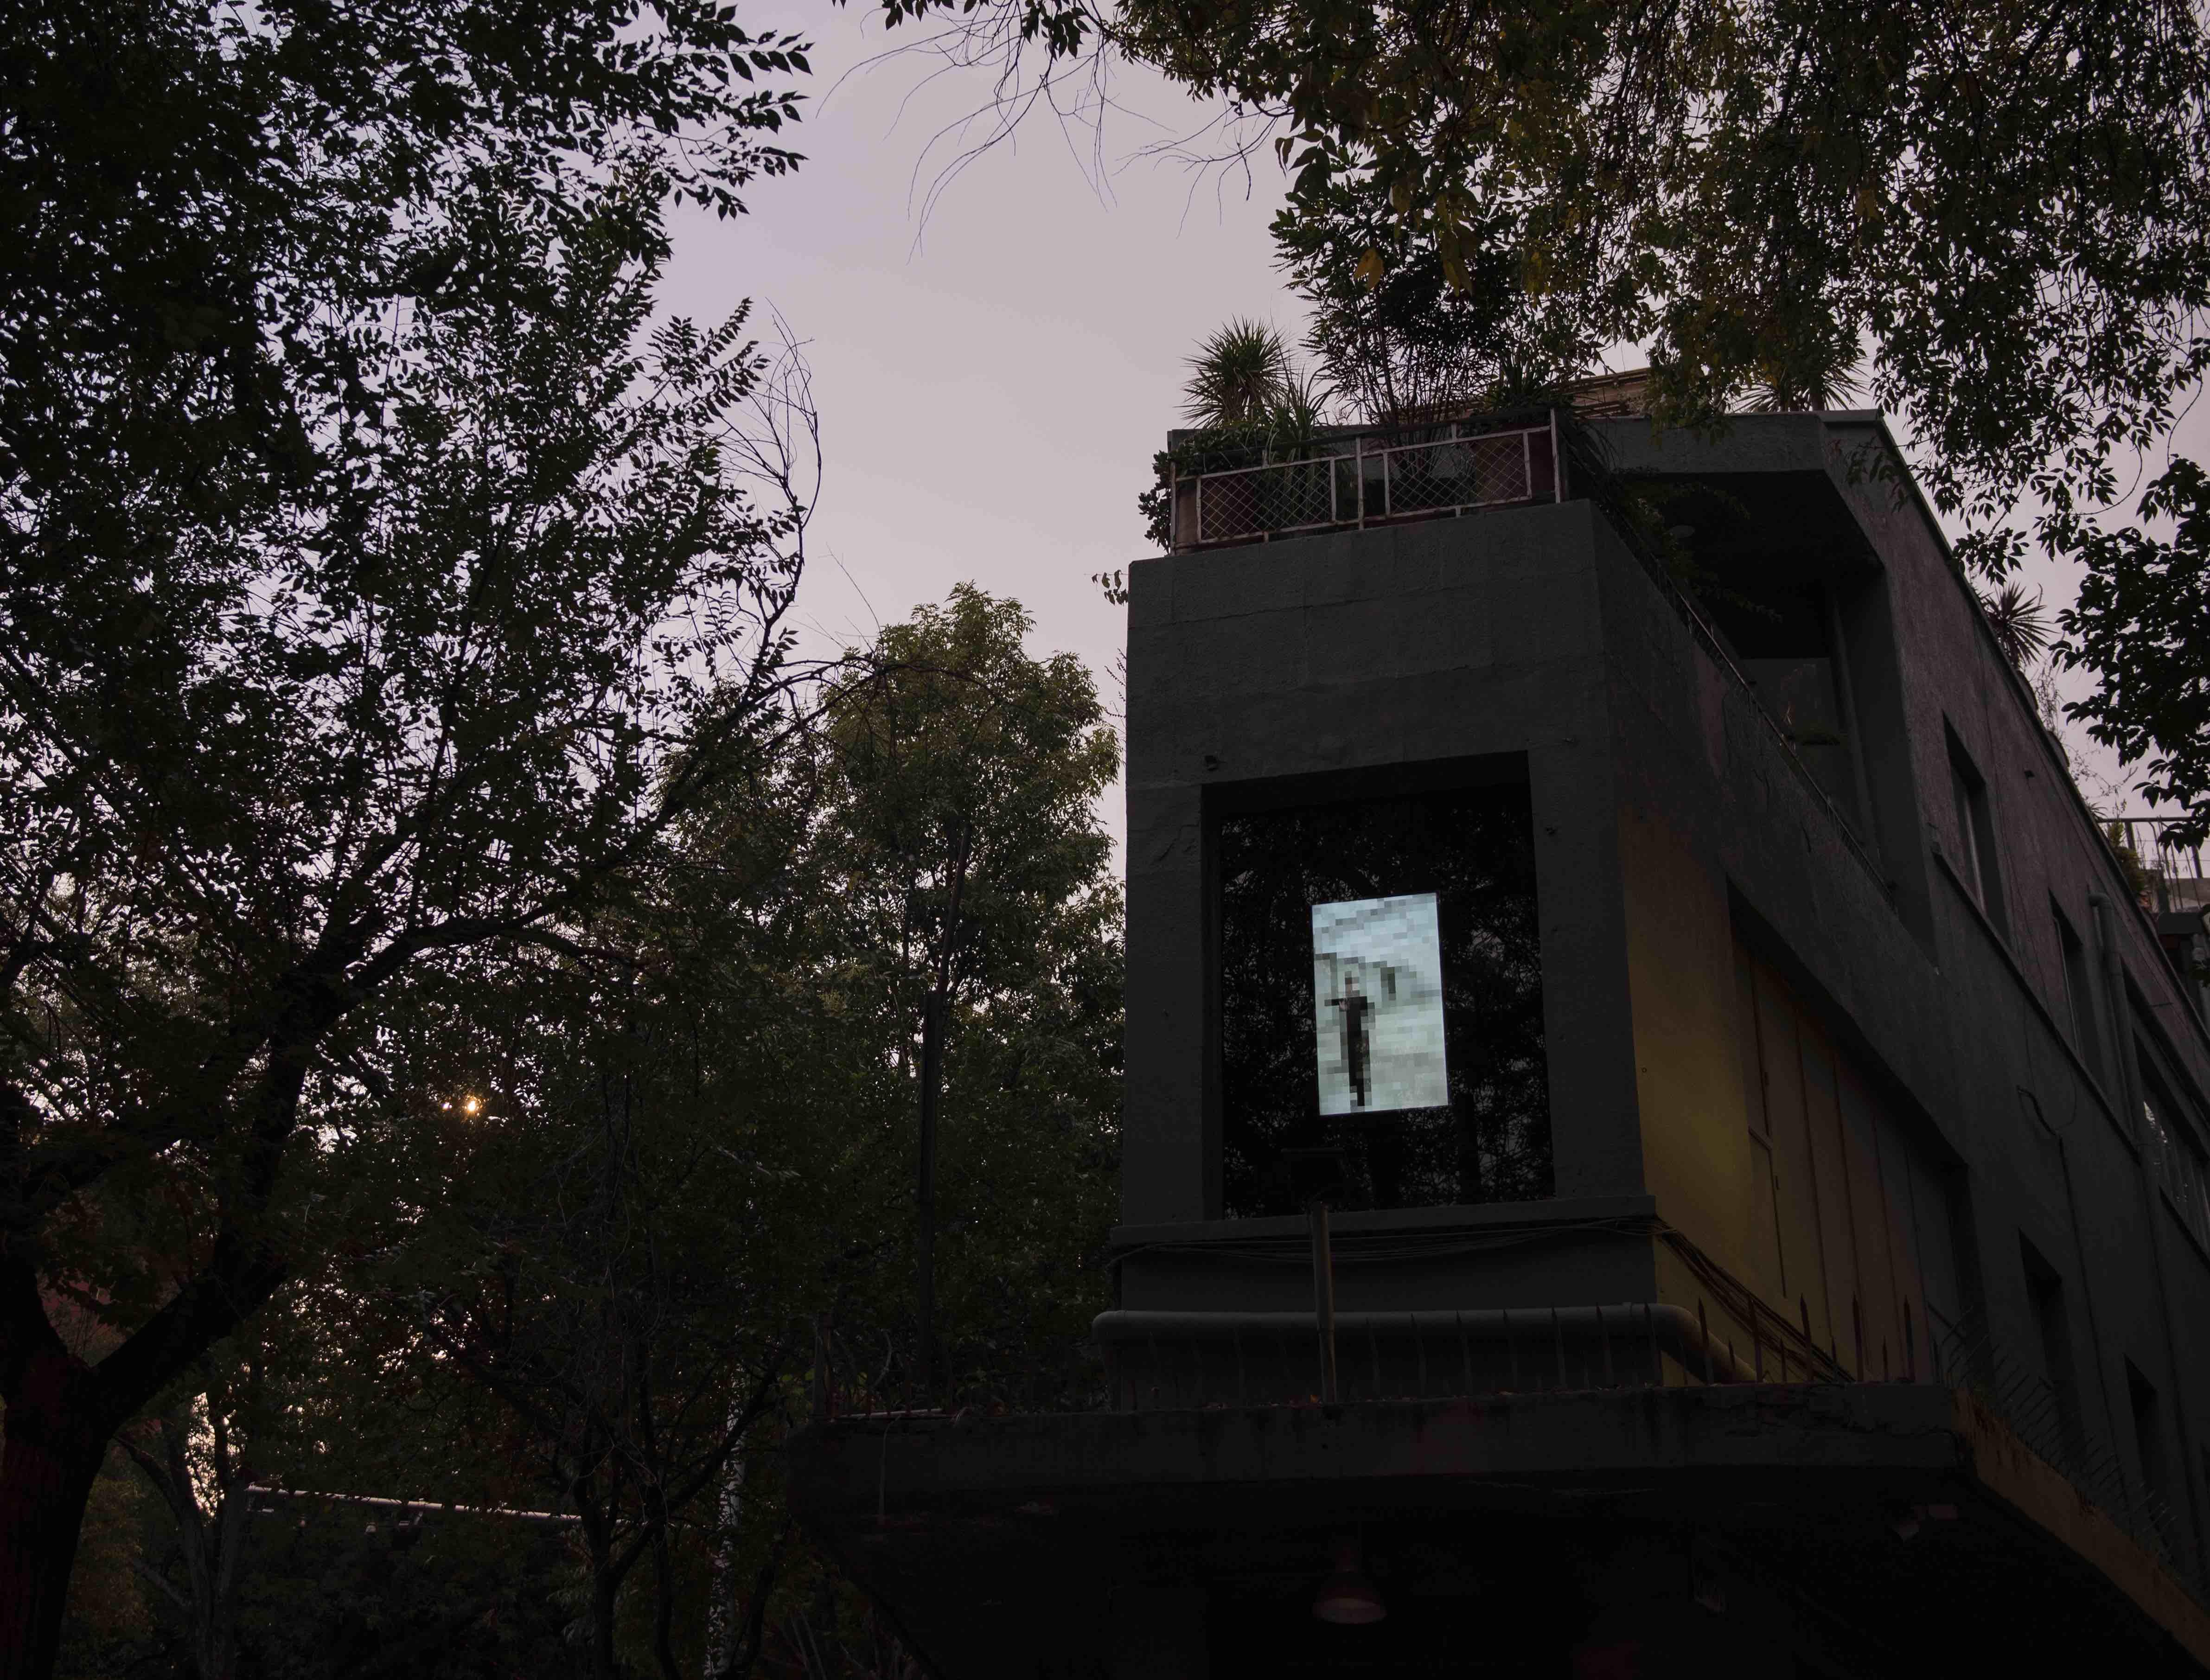 Perpetrator, UBERMORGEN, Festival del Silencio, Aparador Cuchilla México, 2020. Foto: Alonso Cedillo